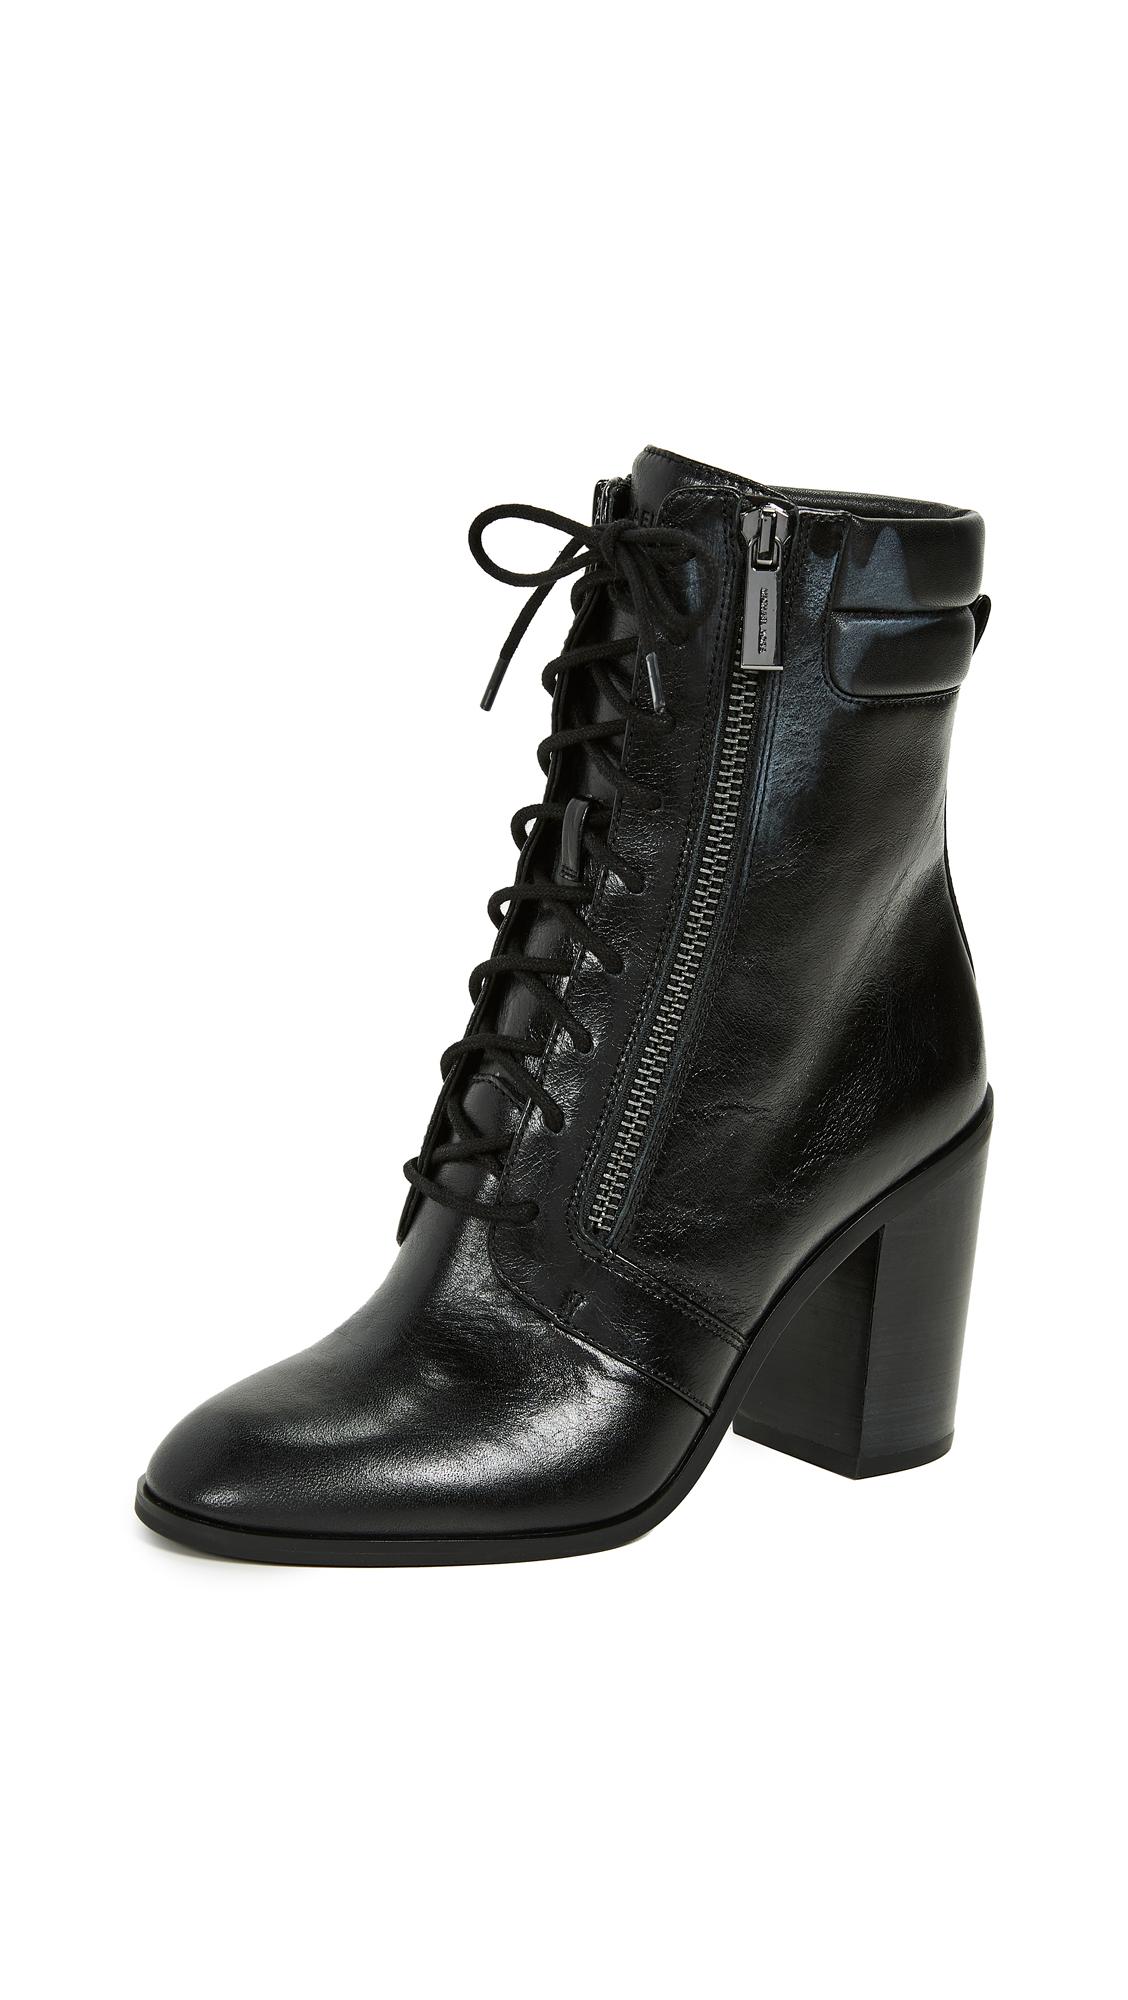 MICHAEL Michael Kors Rosario Lace Up Boots - Black